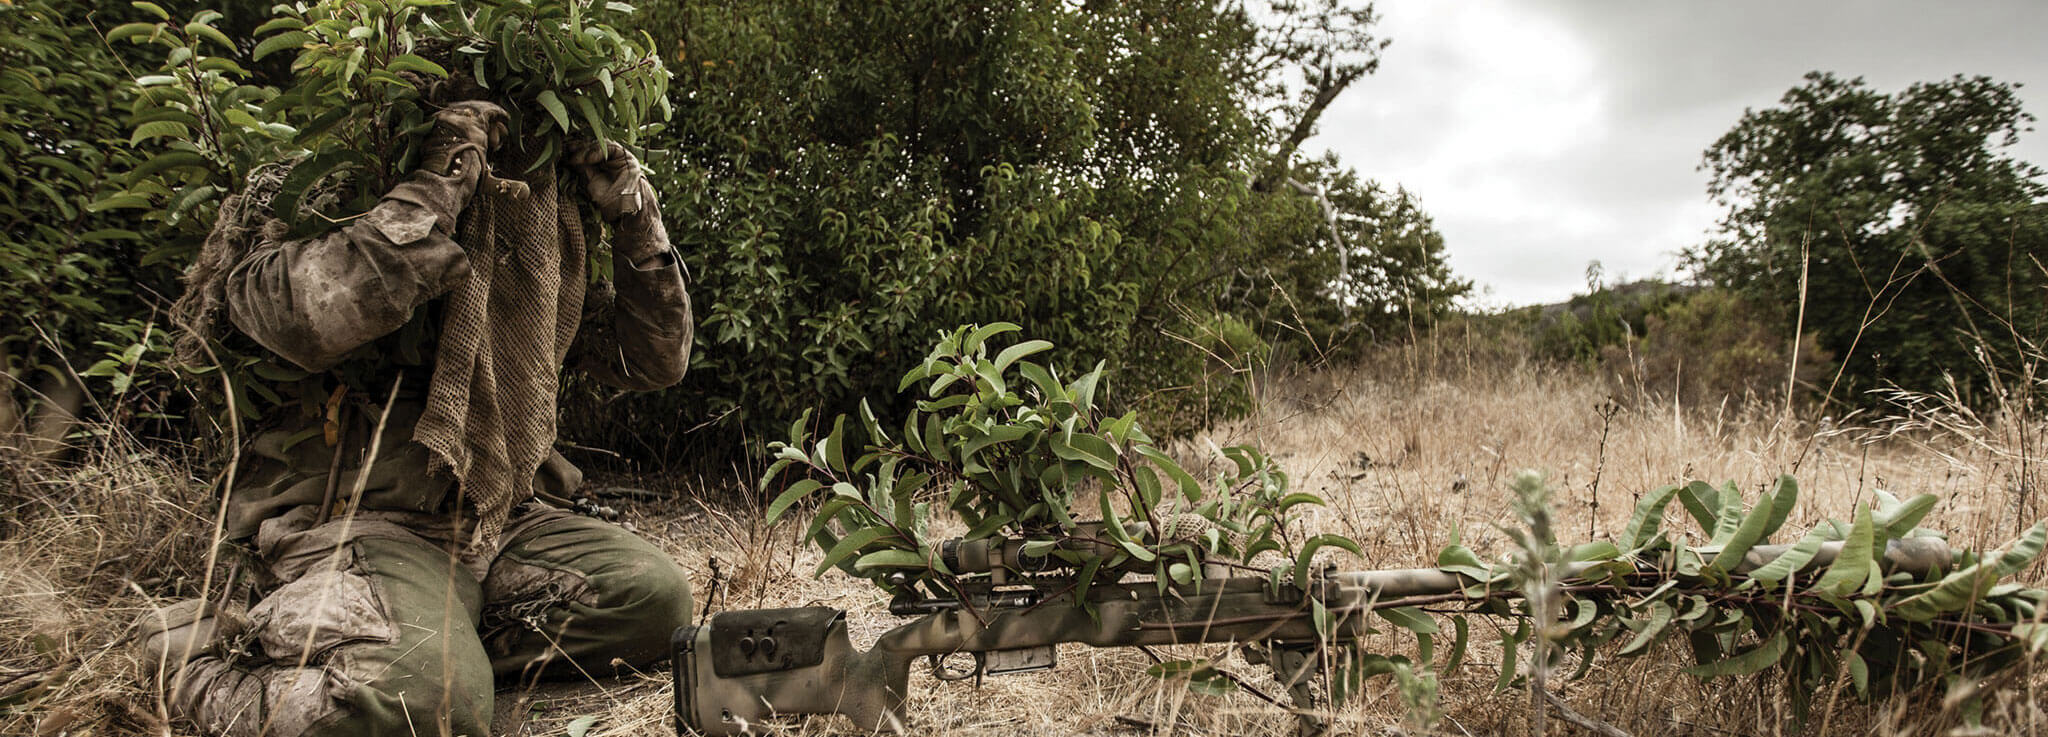 Drawn snipers marine sniper 2048 USMCSSA Home Association Website